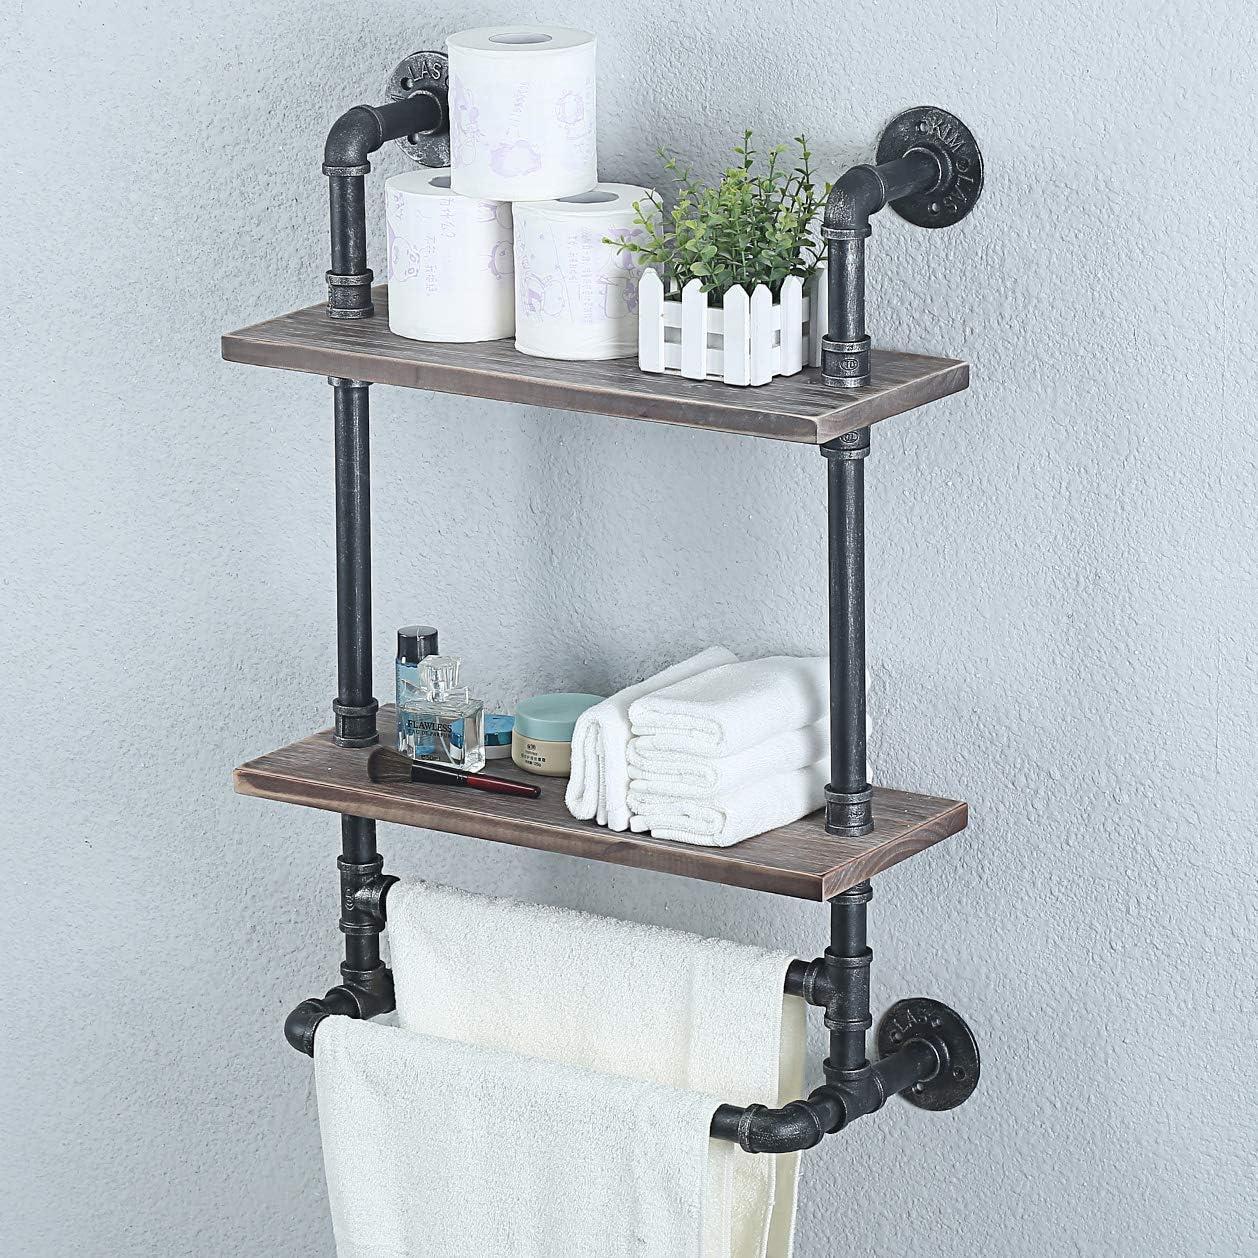 Wood Decor Pipe Oak /& Iron Towel Bar Kitchen Remodel Designer Bathroom Accessories Rustic Industrial